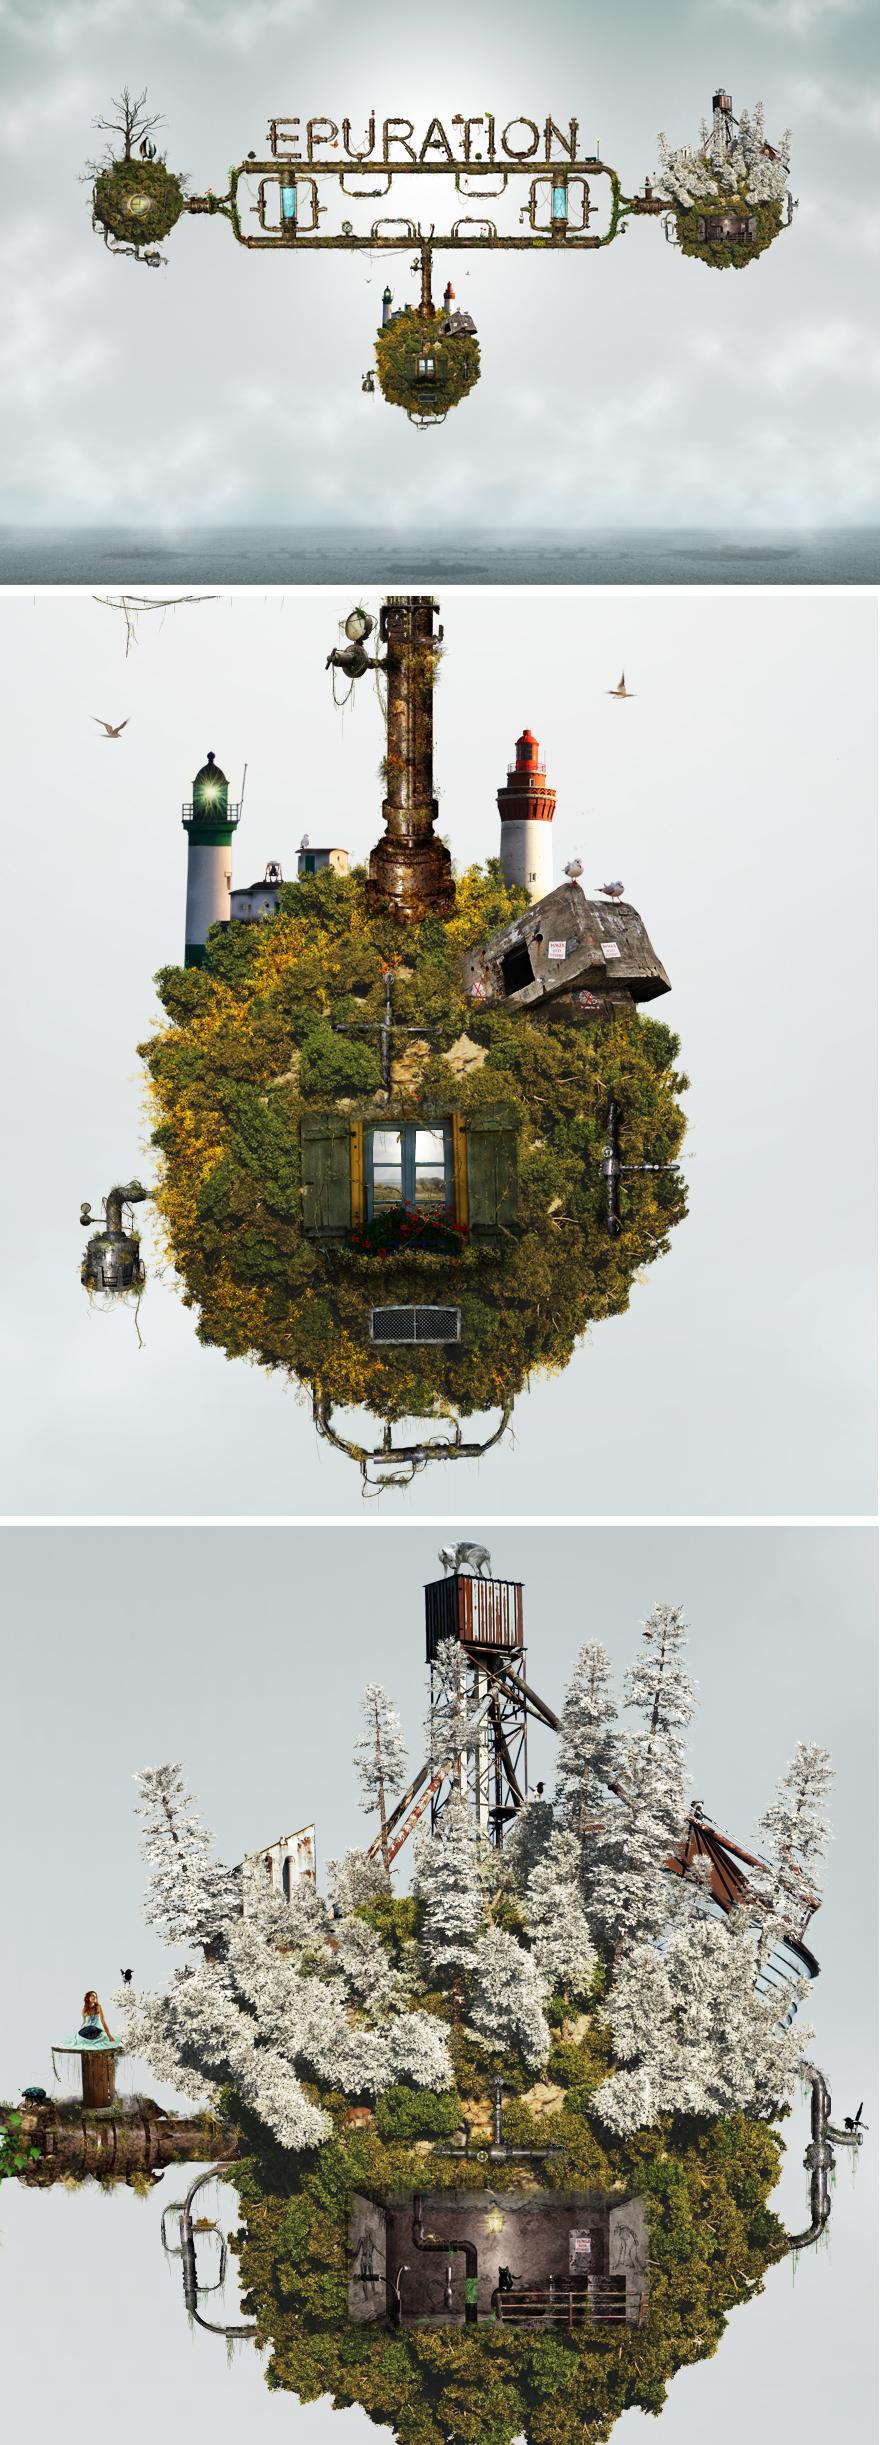 Epuration - Photoshop - Creattica